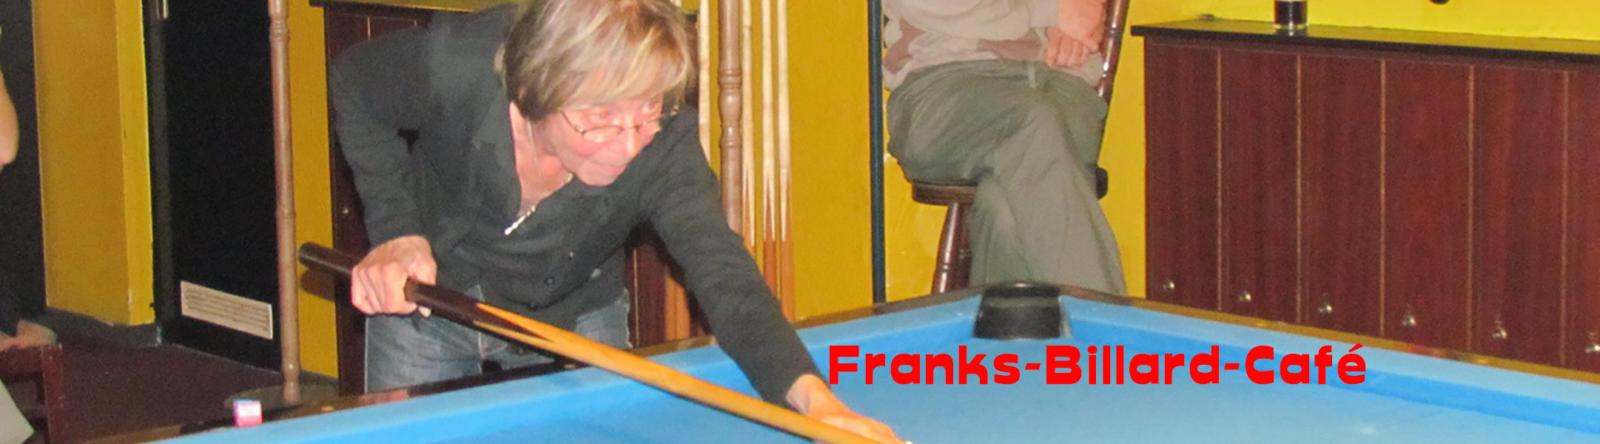 Franks-Billard-Cafe